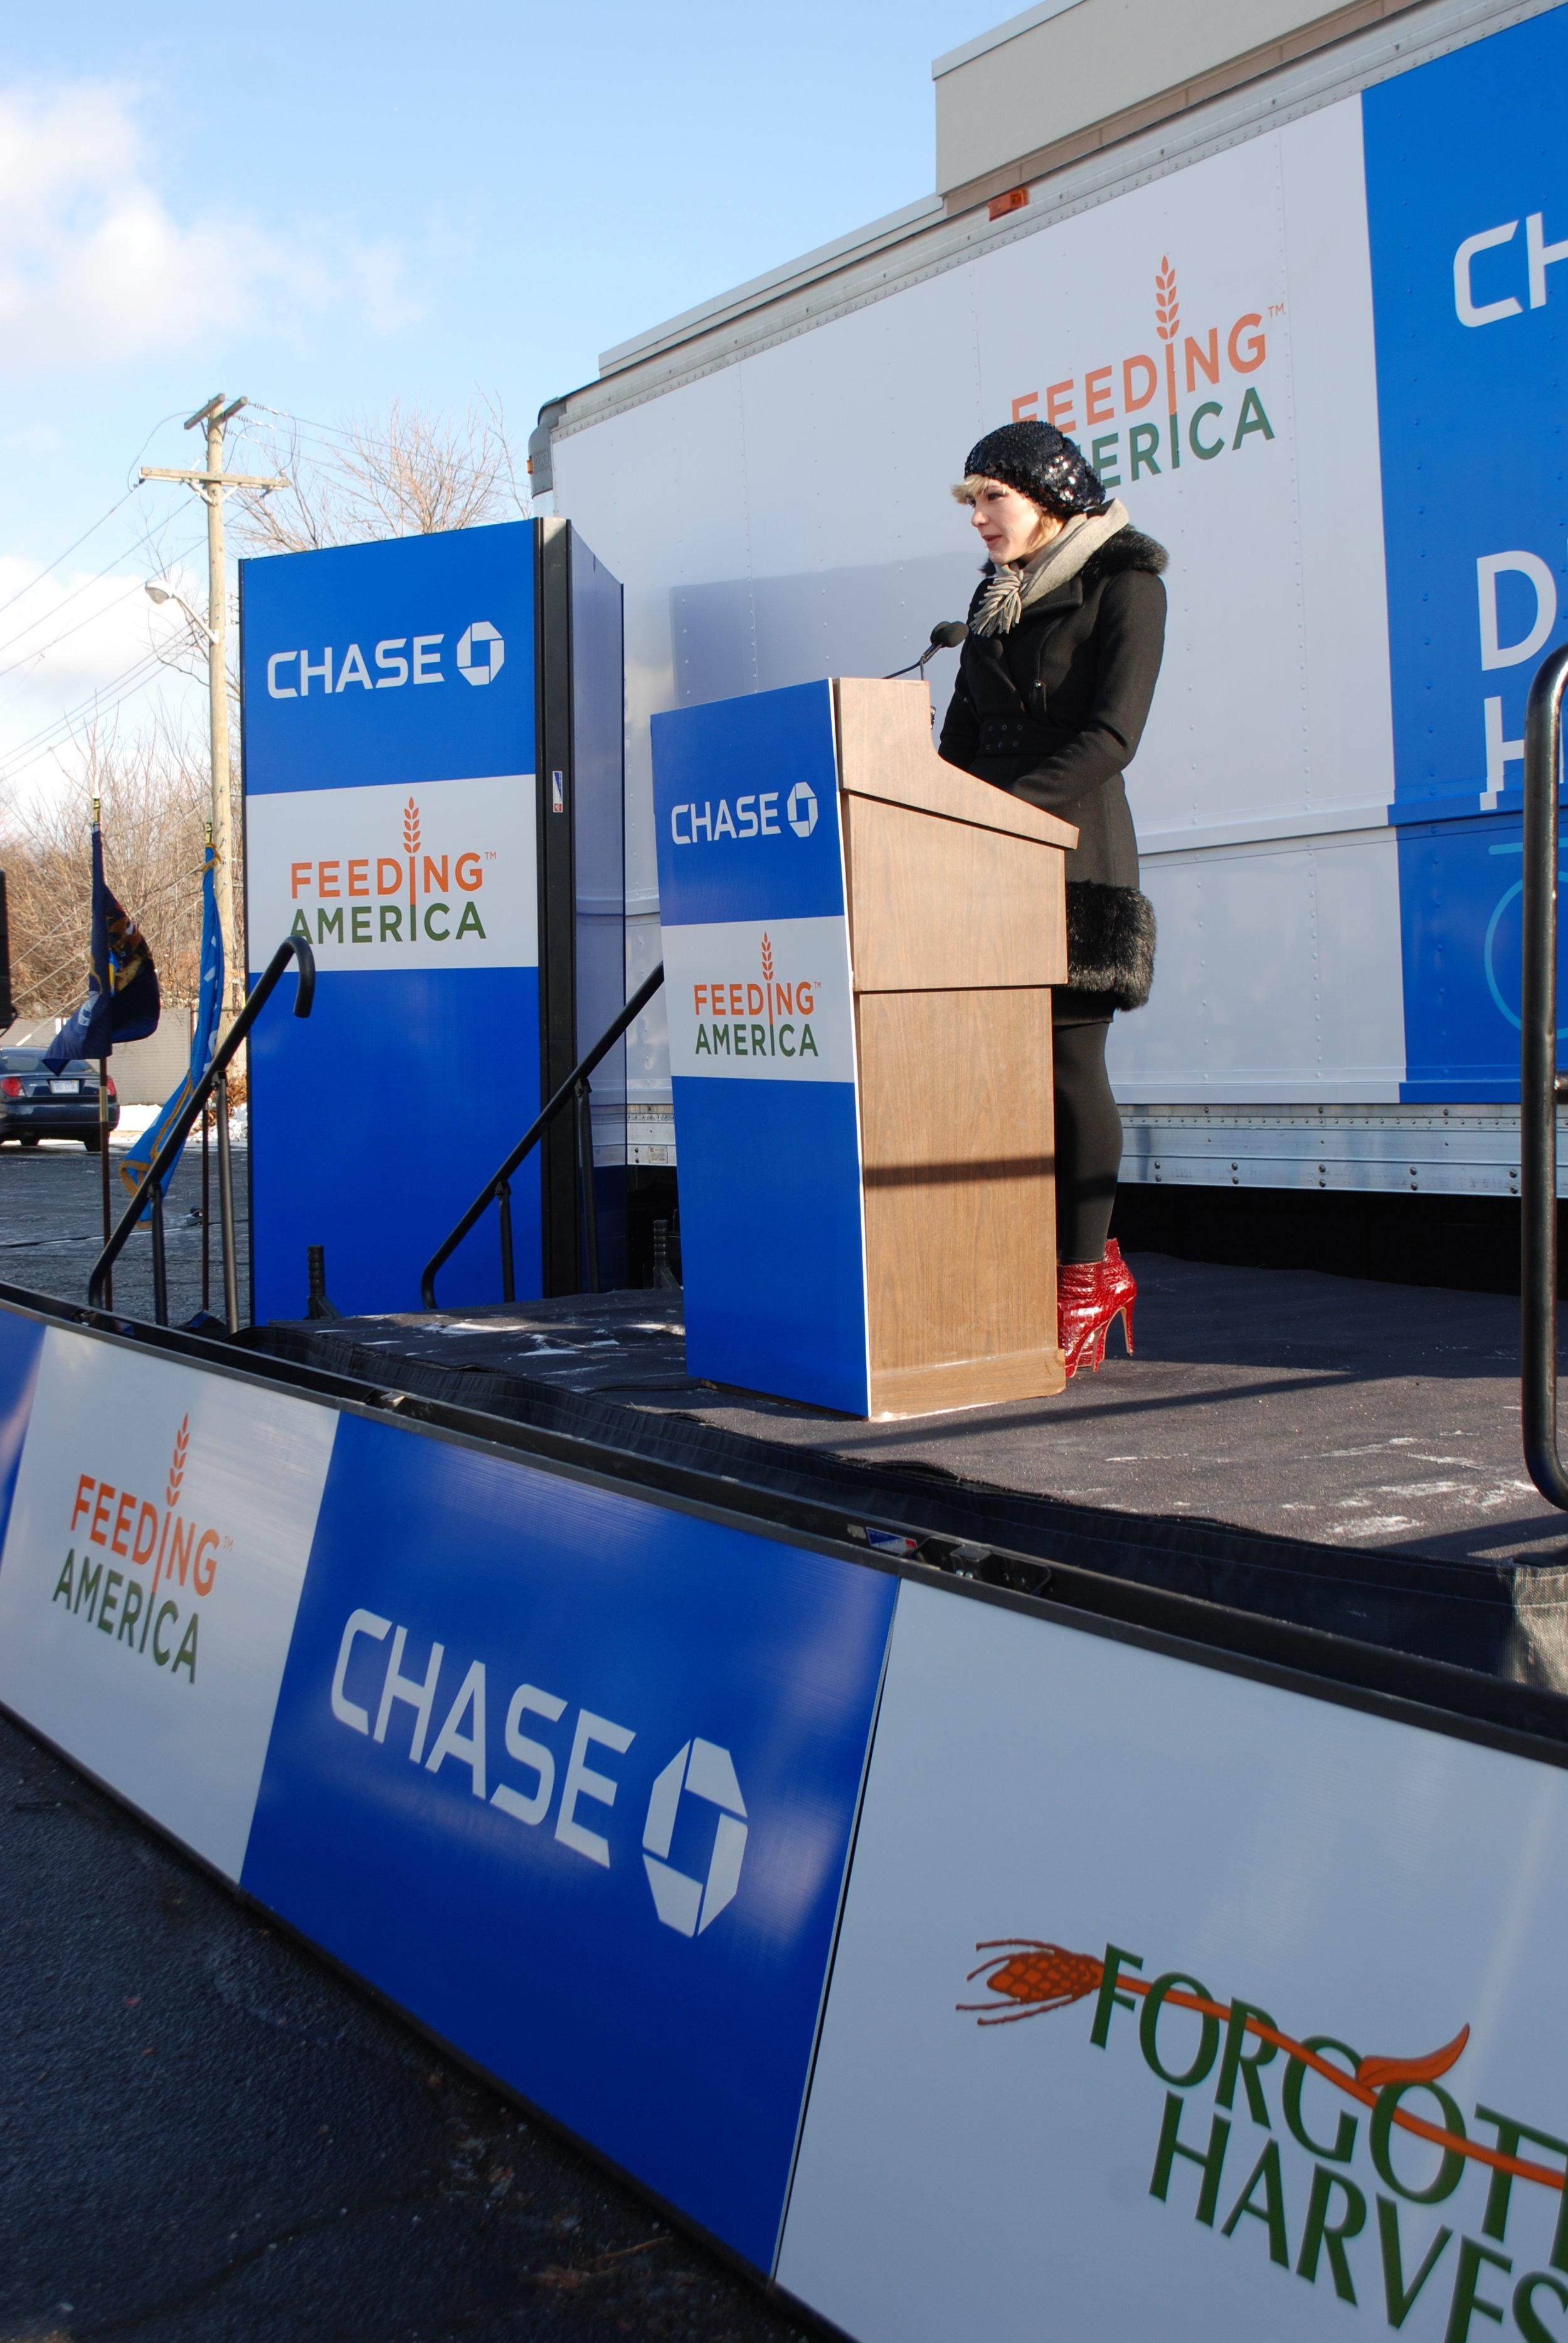 ChaseFeedingAmerica_APCG3.jpg